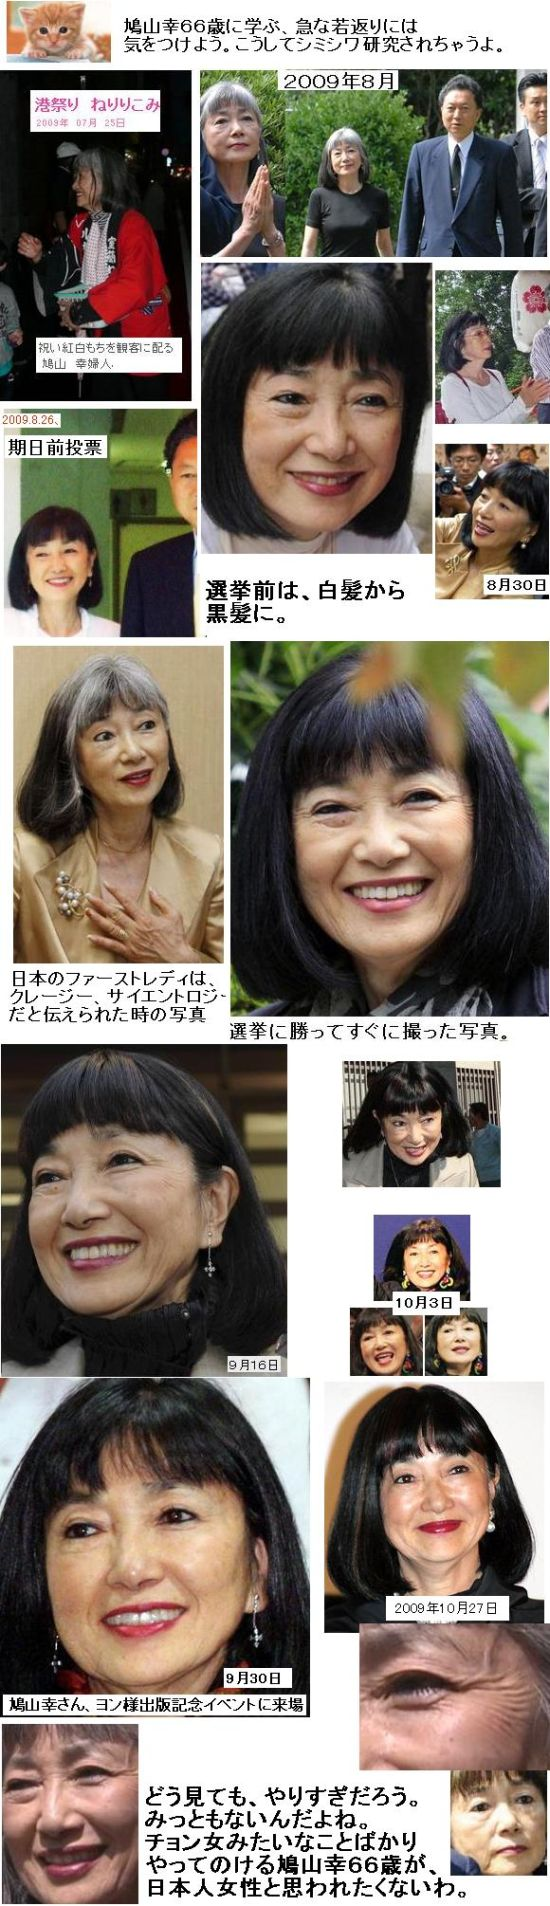 miyukihatoyama662009nen1.jpg